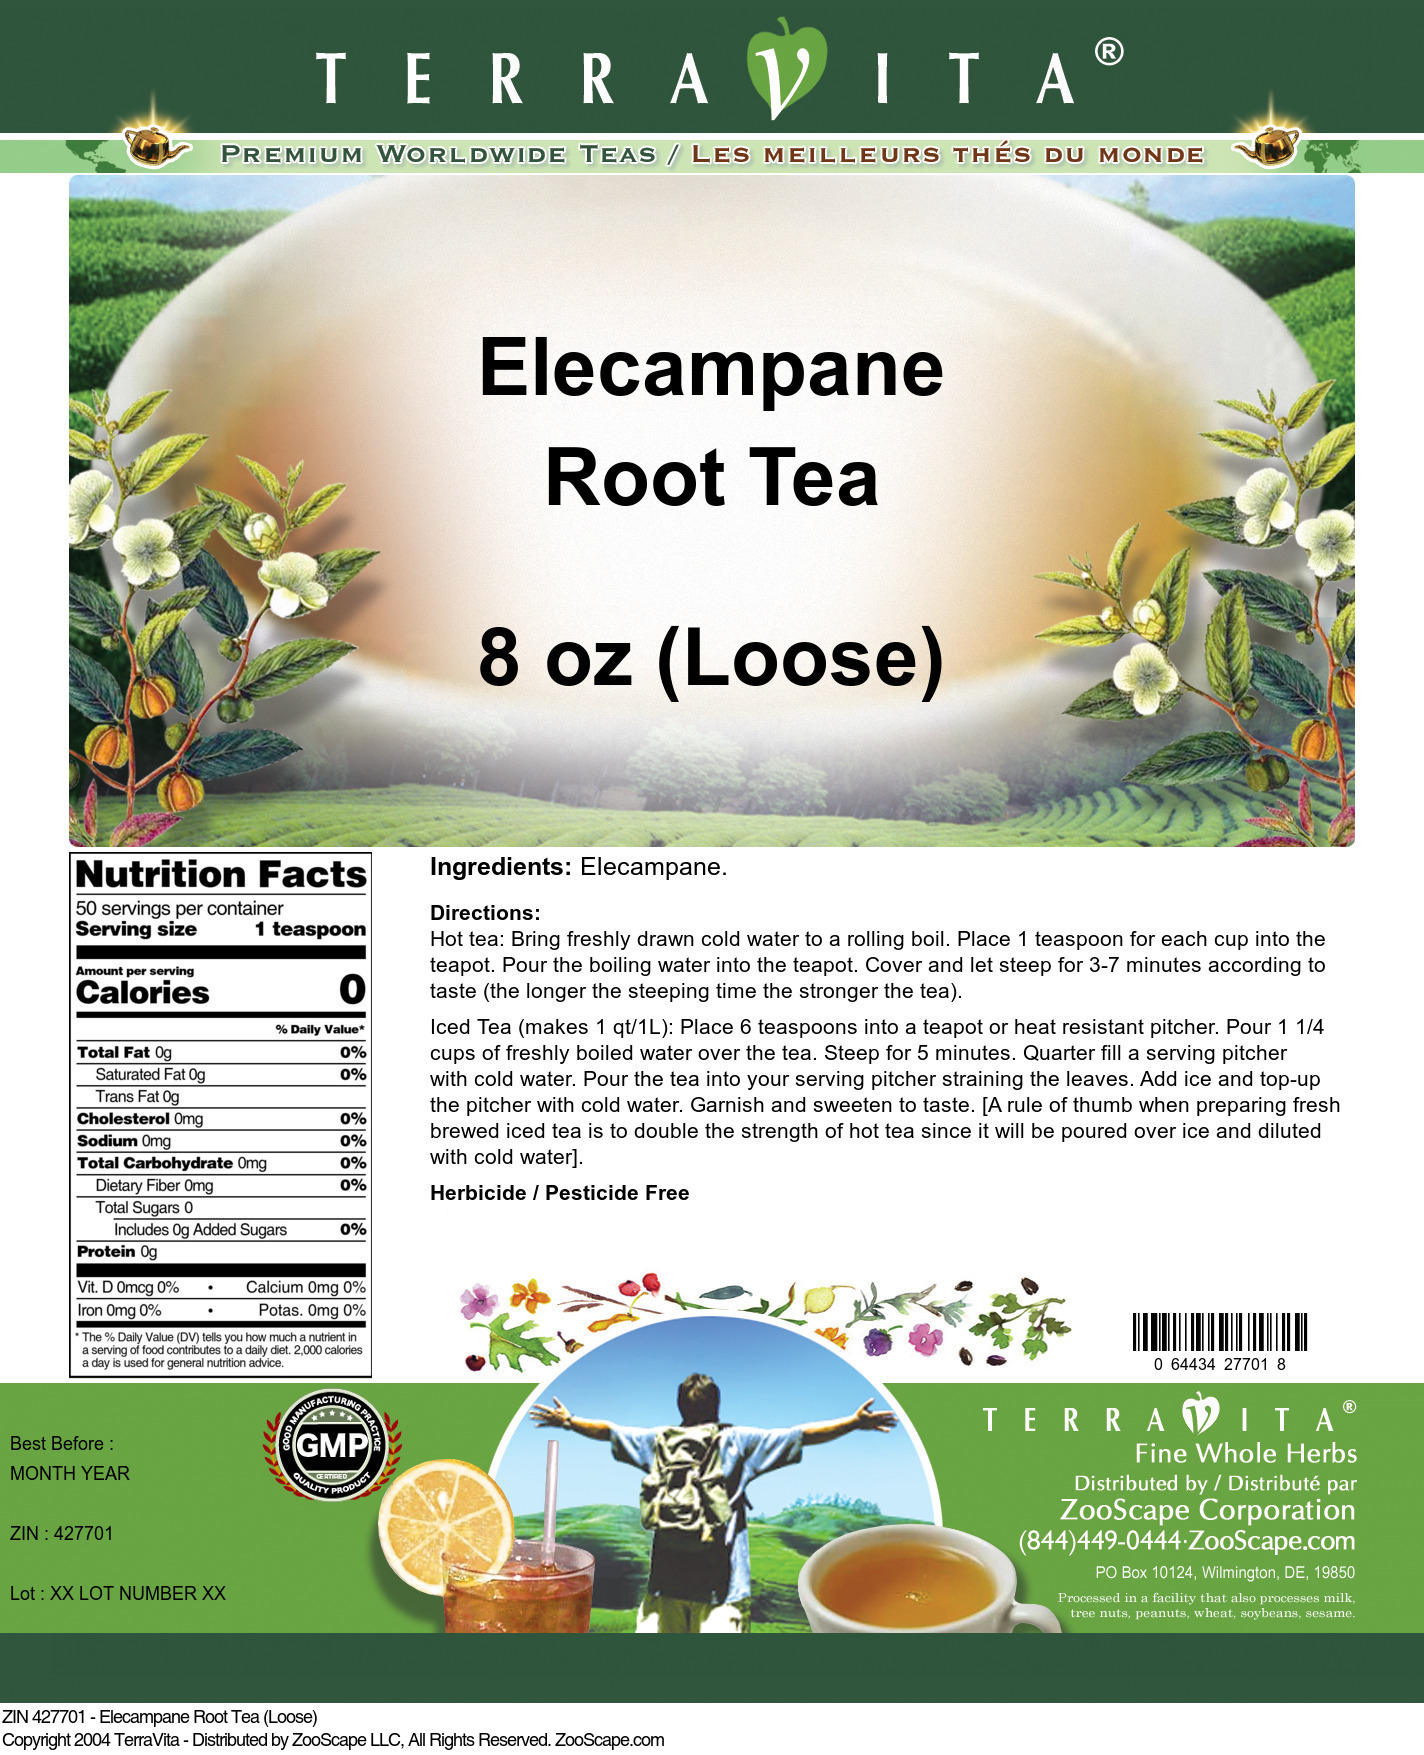 Elecampane Root Tea (Loose)